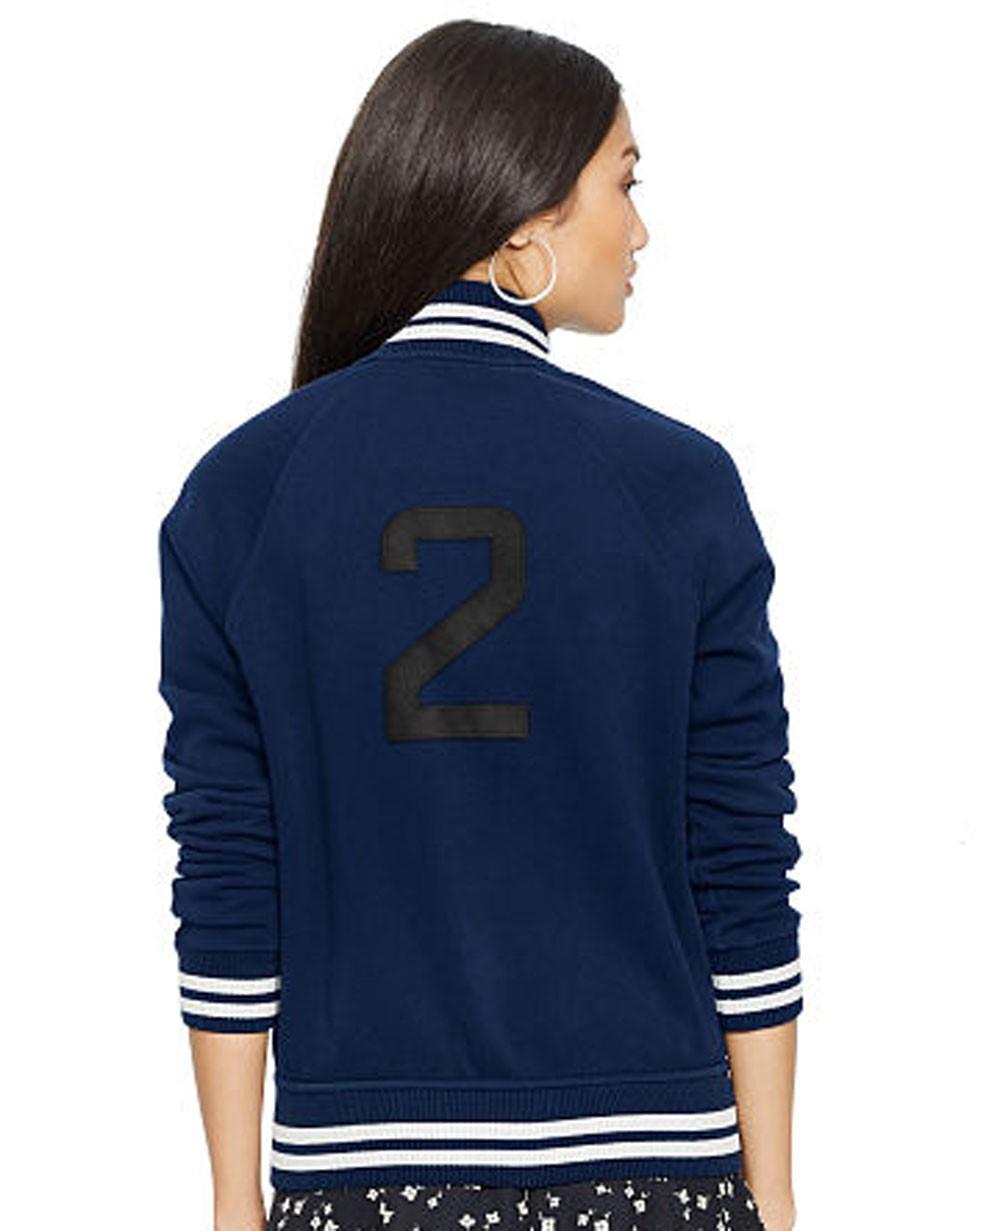 New Fashionable Women Zipper Varsity Jacket